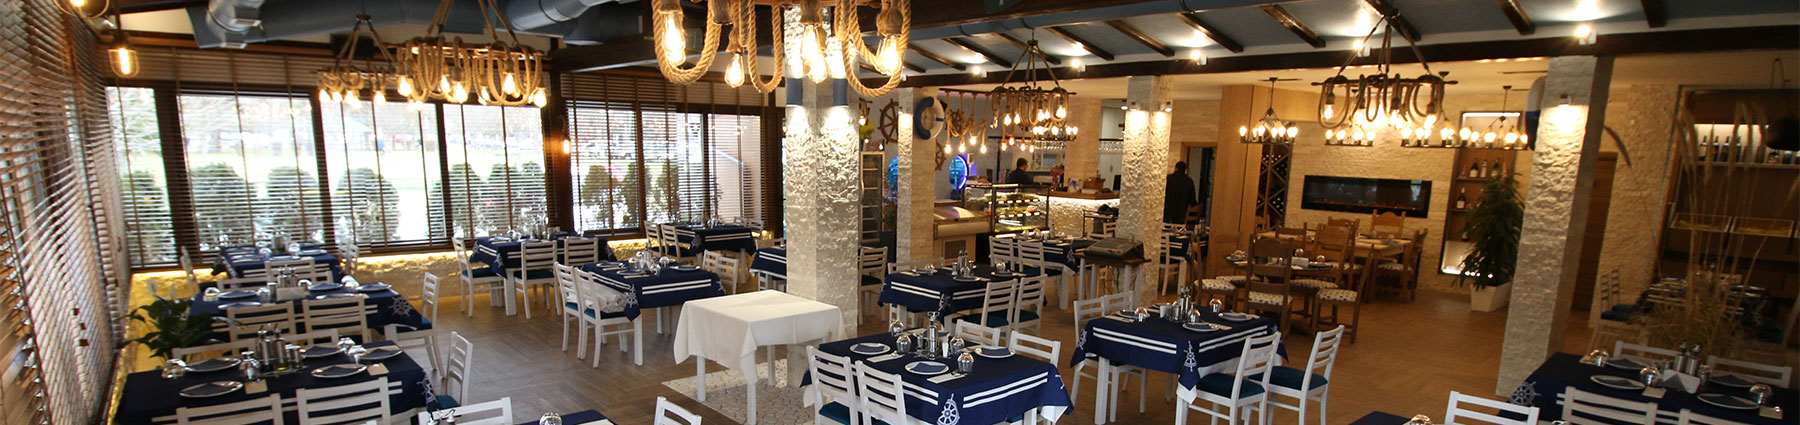 Ресторан Лангуста